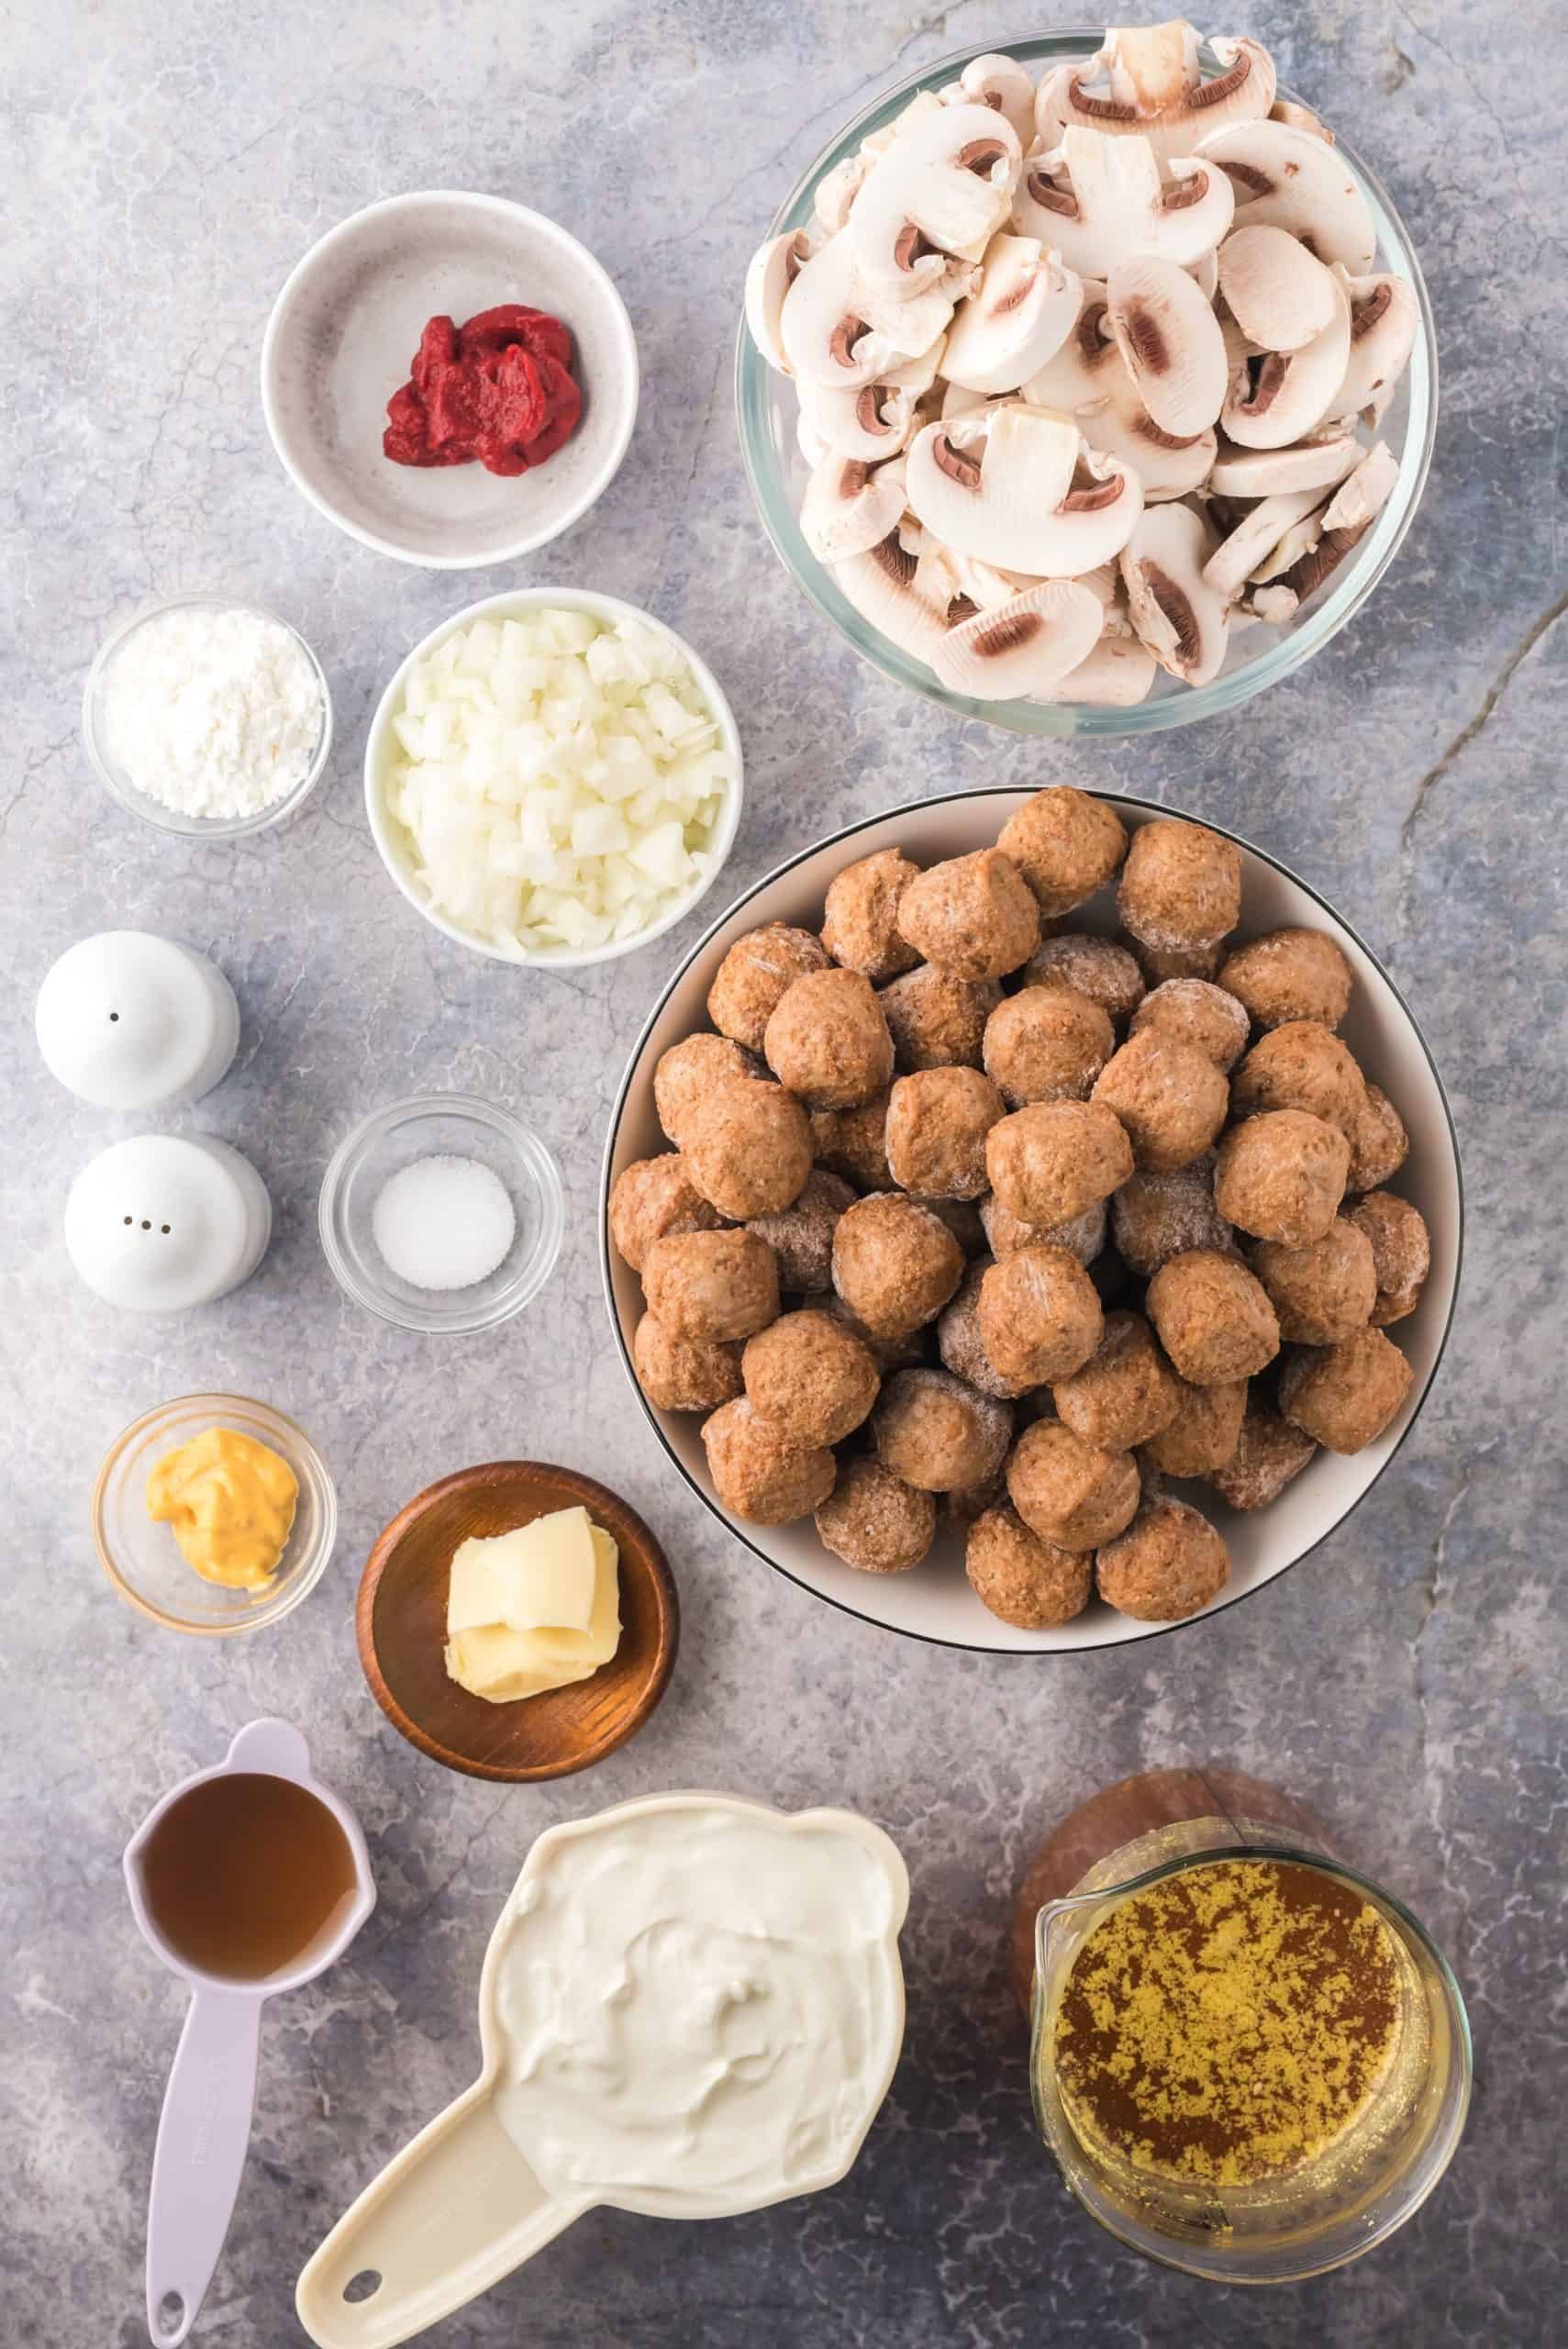 Ingredients needed to make Crock Pot Meatball Stroganoff: unsalted butter, onion, sliced mushrooms, cooked frozen meatballs, beef broth, tomato paste, mustard, sour cream, cornstarch, water